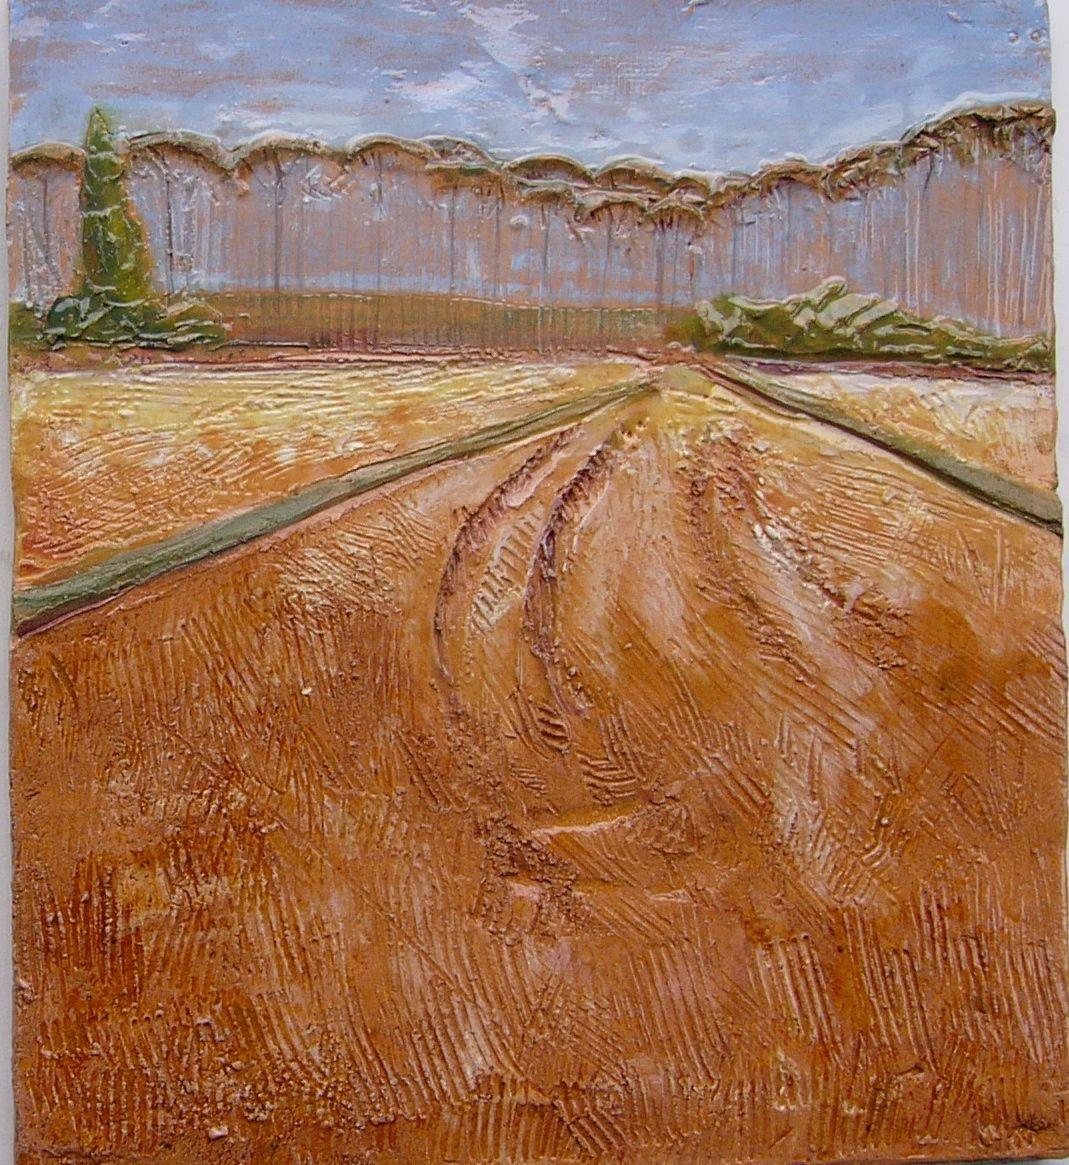 Risaie a Bestazzo - 2 The rice fields of Bestazzo -2